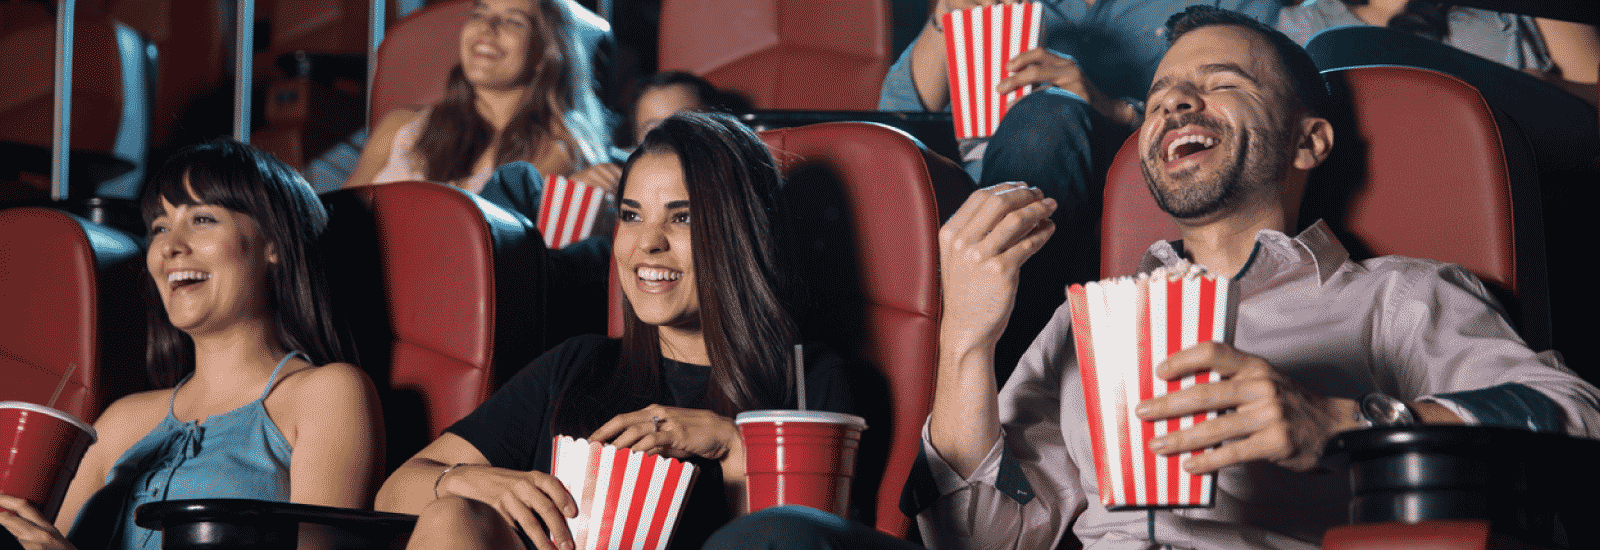 JBLE Movie Theaters